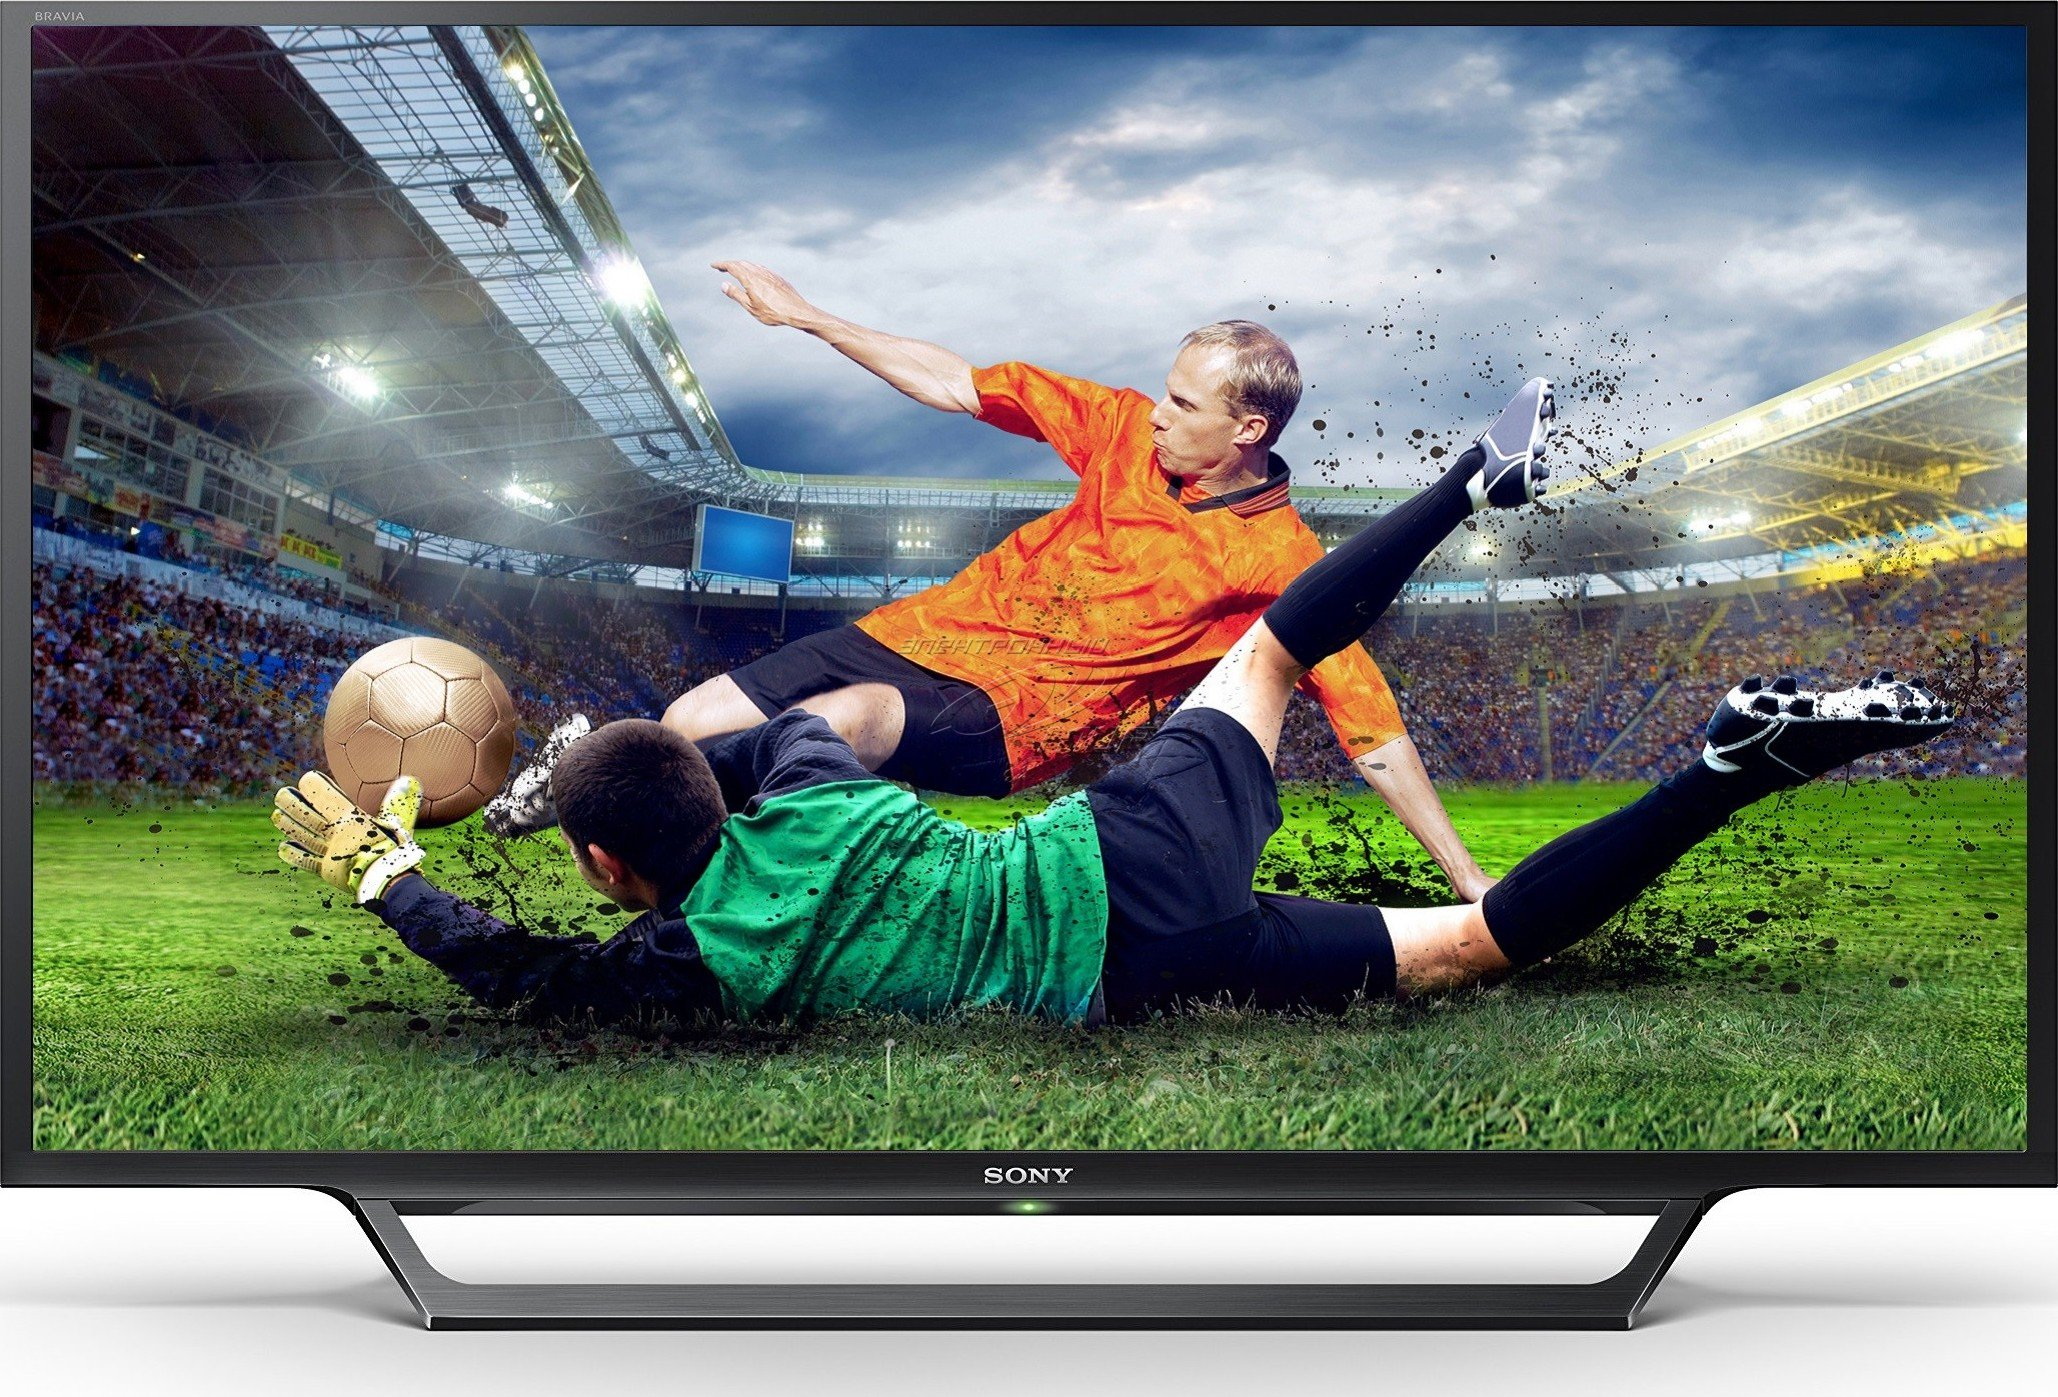 Топ5 телевизоров лета 2017 - телевизор Sony футбол